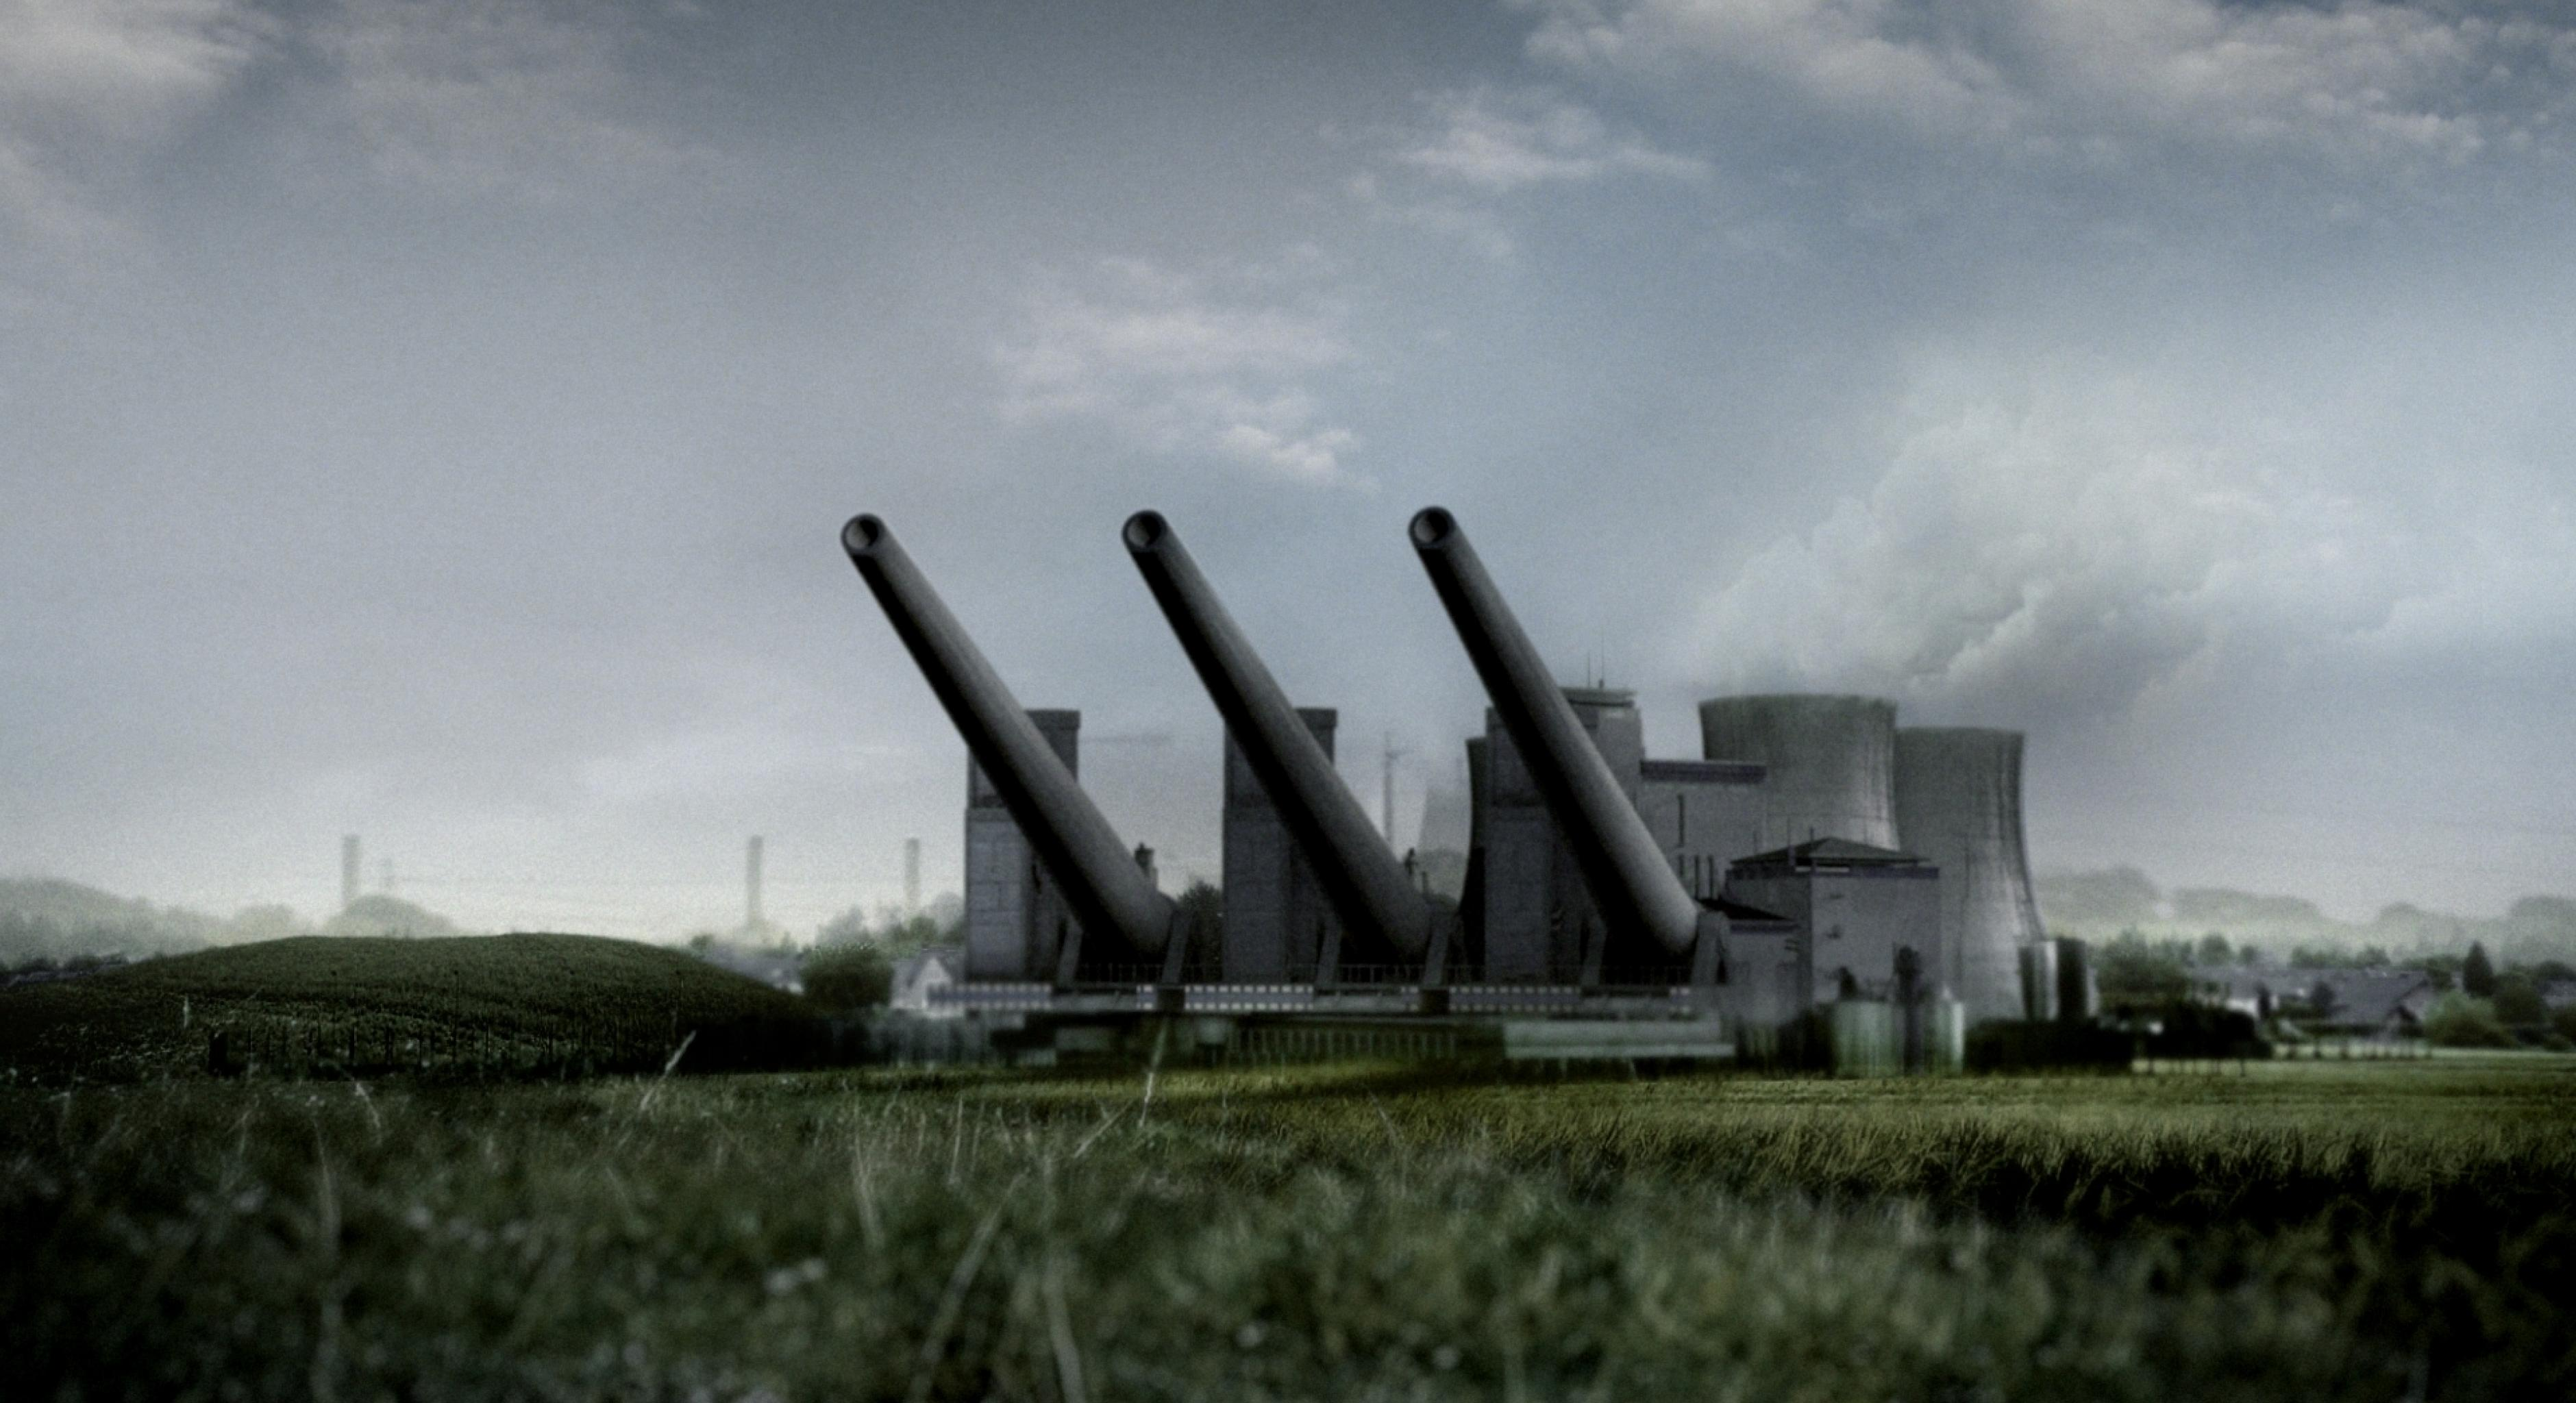 Foto: Film ab gegen Kohlekraft: Klima schützen – Armut verhindern! © Oxfam Deuts